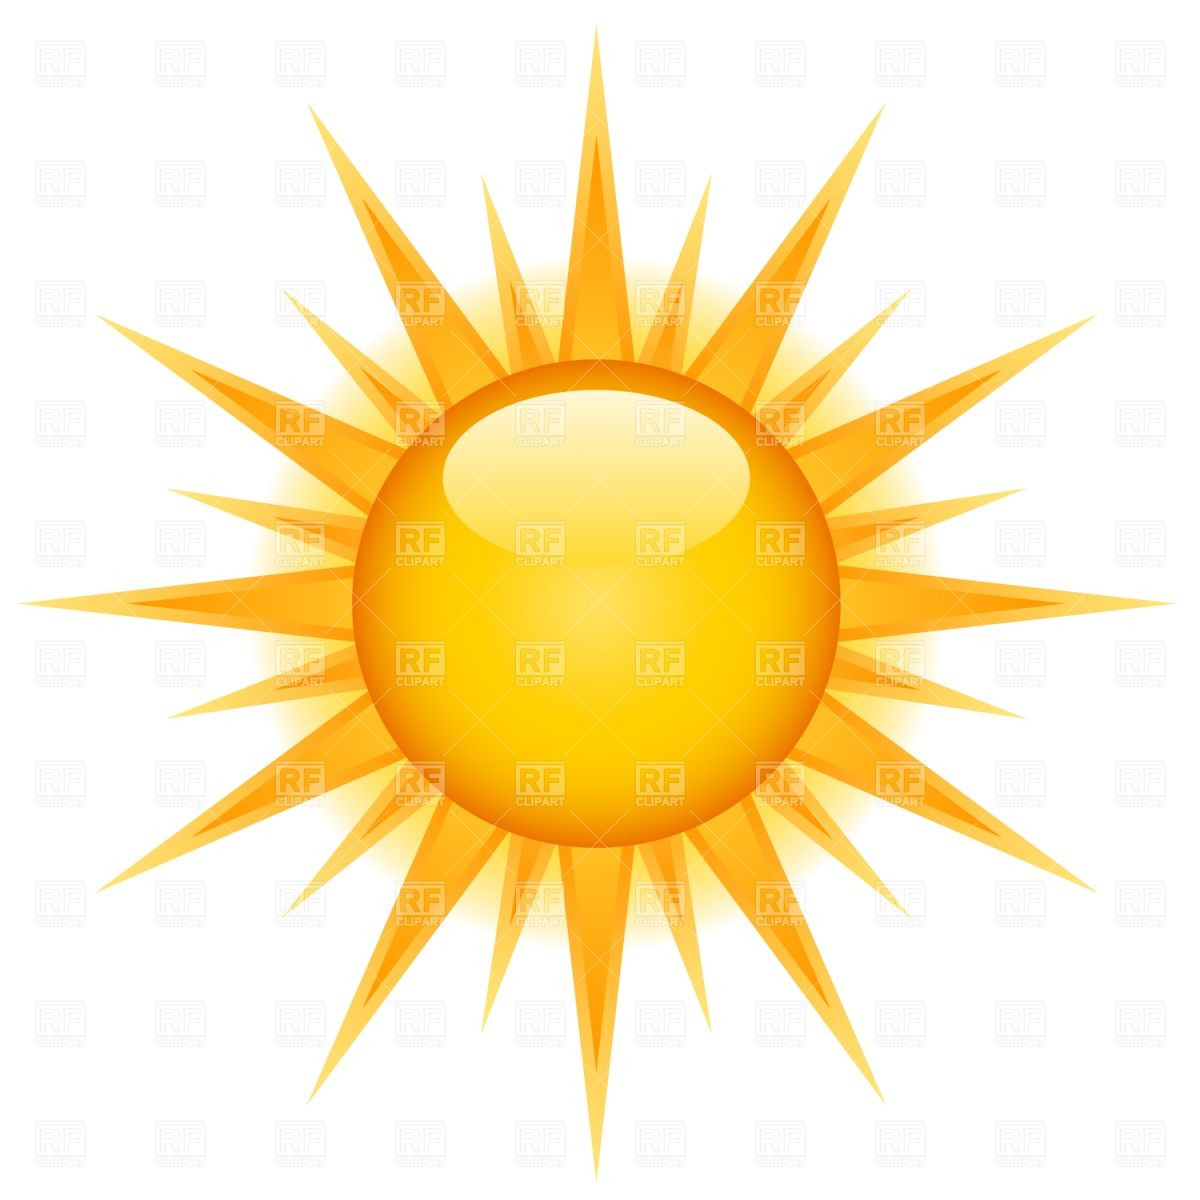 Sun symbol clipart clipground glossy sun icon vector image 1526 buycottarizona Images